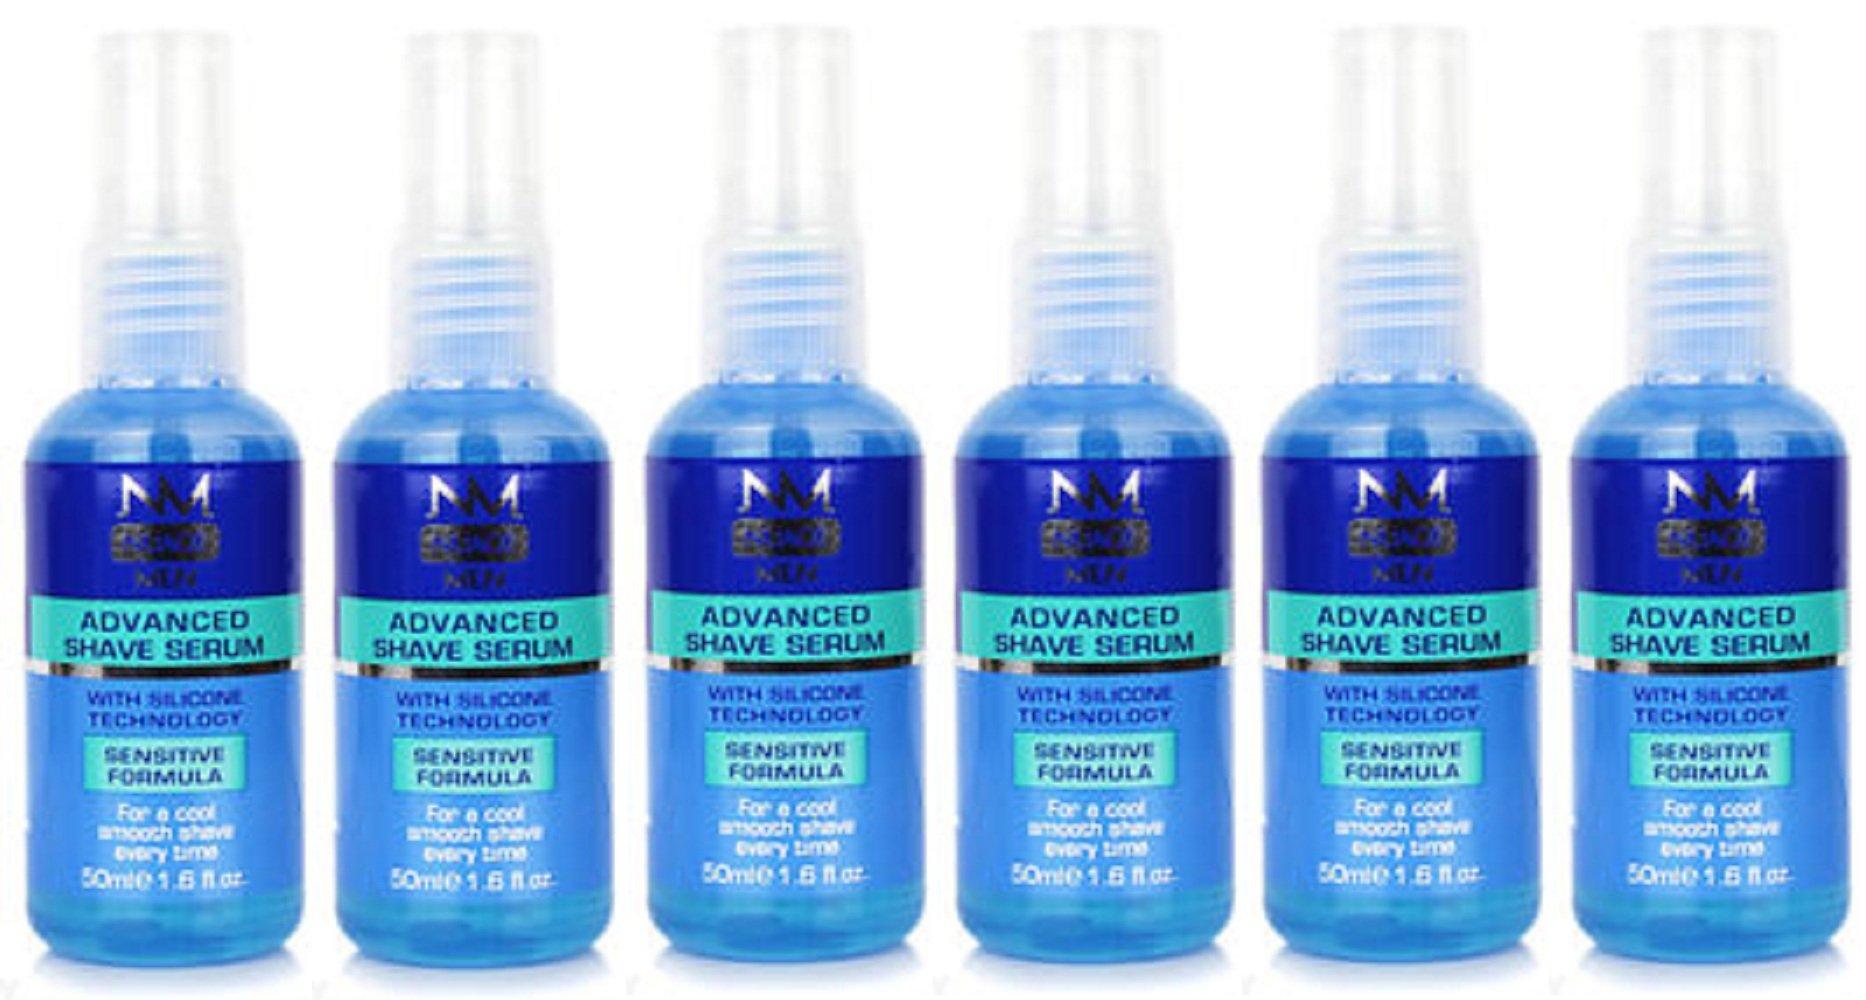 x6 Nuage Men Advanced Shave Serum with Silicon Technology Sensitive Formula 50ml